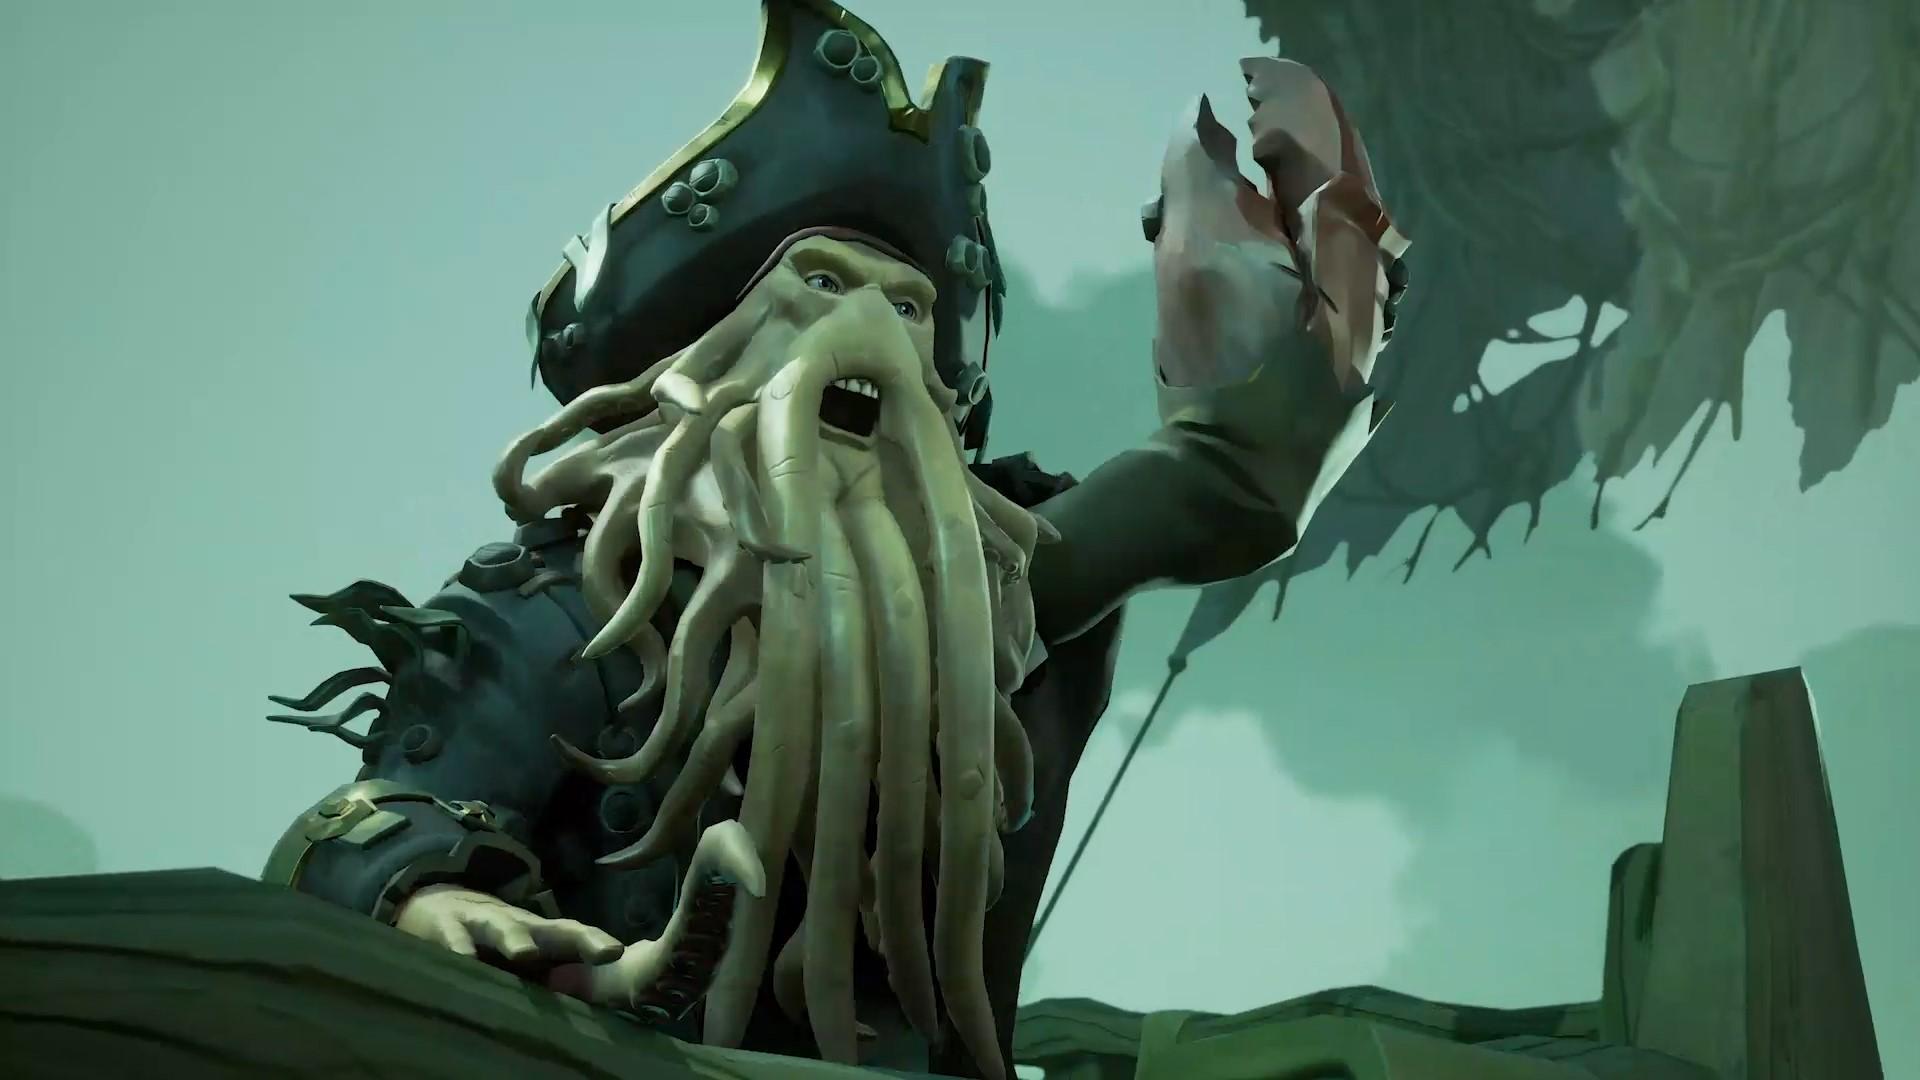 Davy Jones in Sea of Thieves